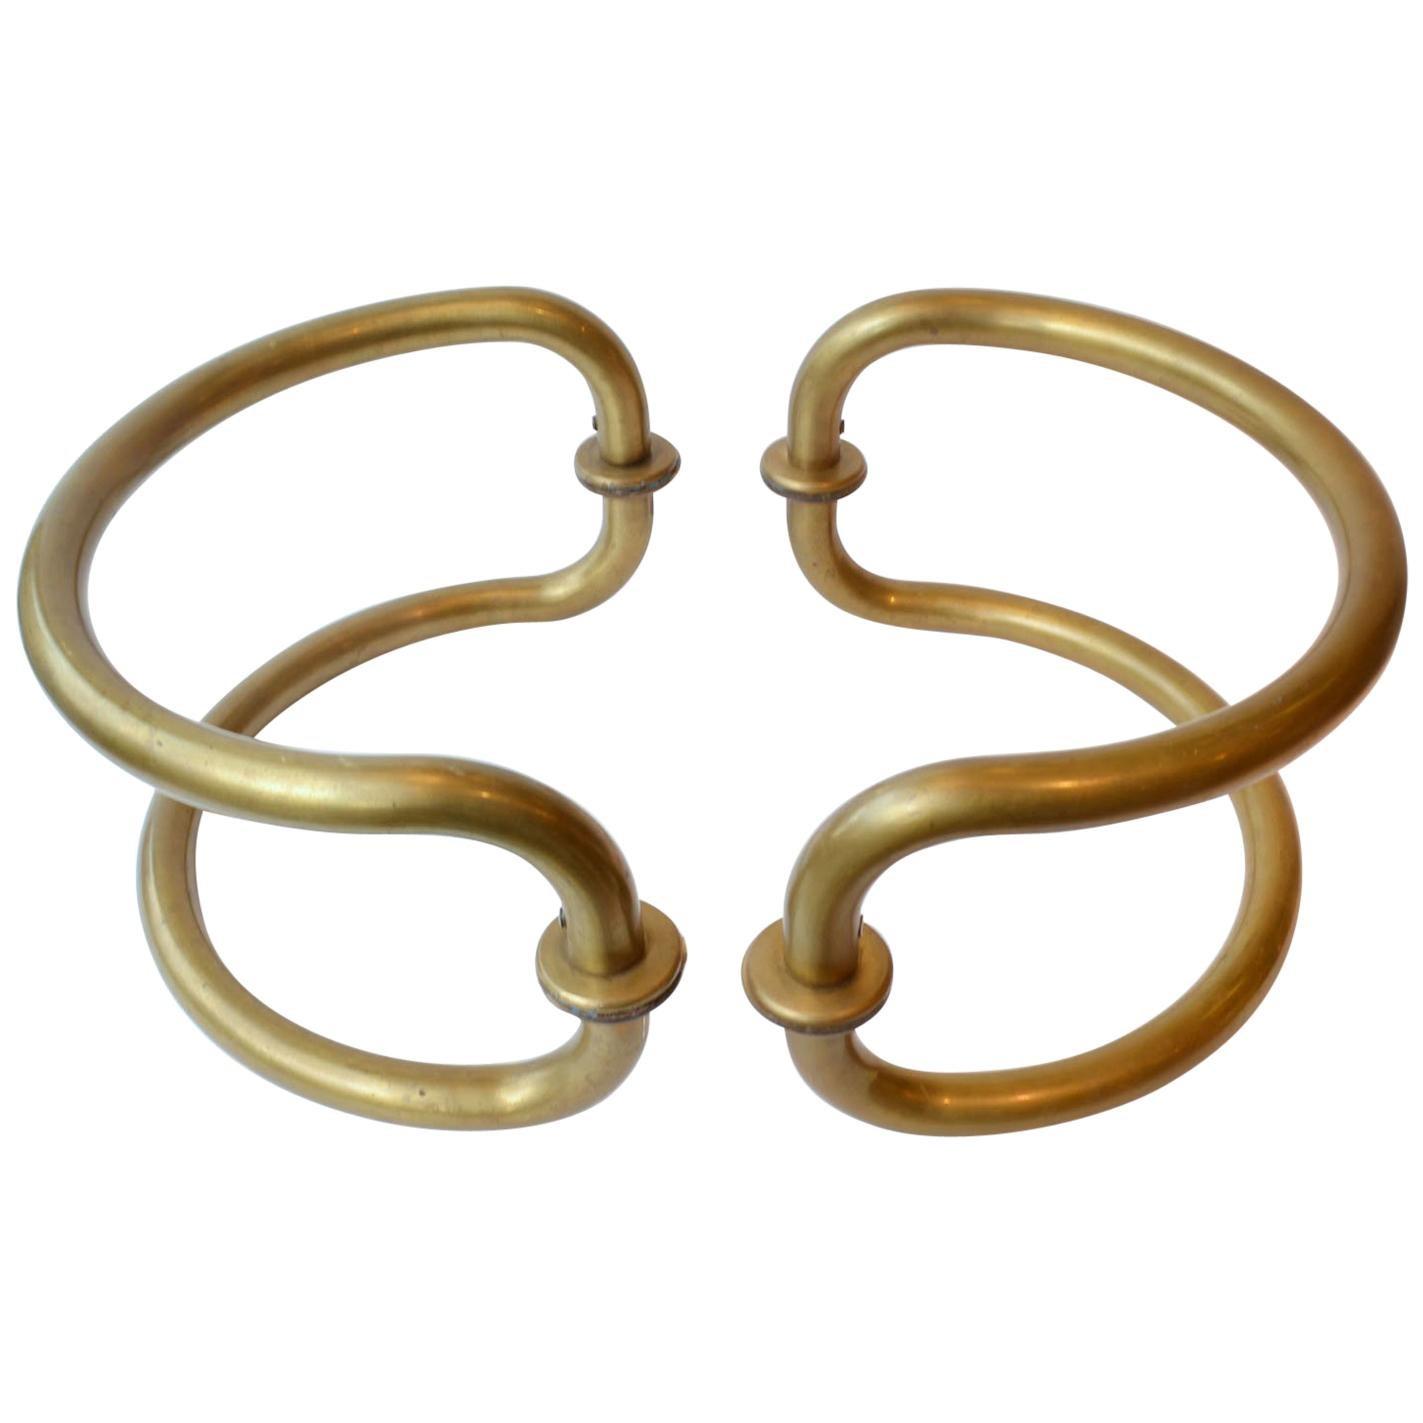 Large Pair of Curved Tubular Brass Double Door Push & Pull Door Handles